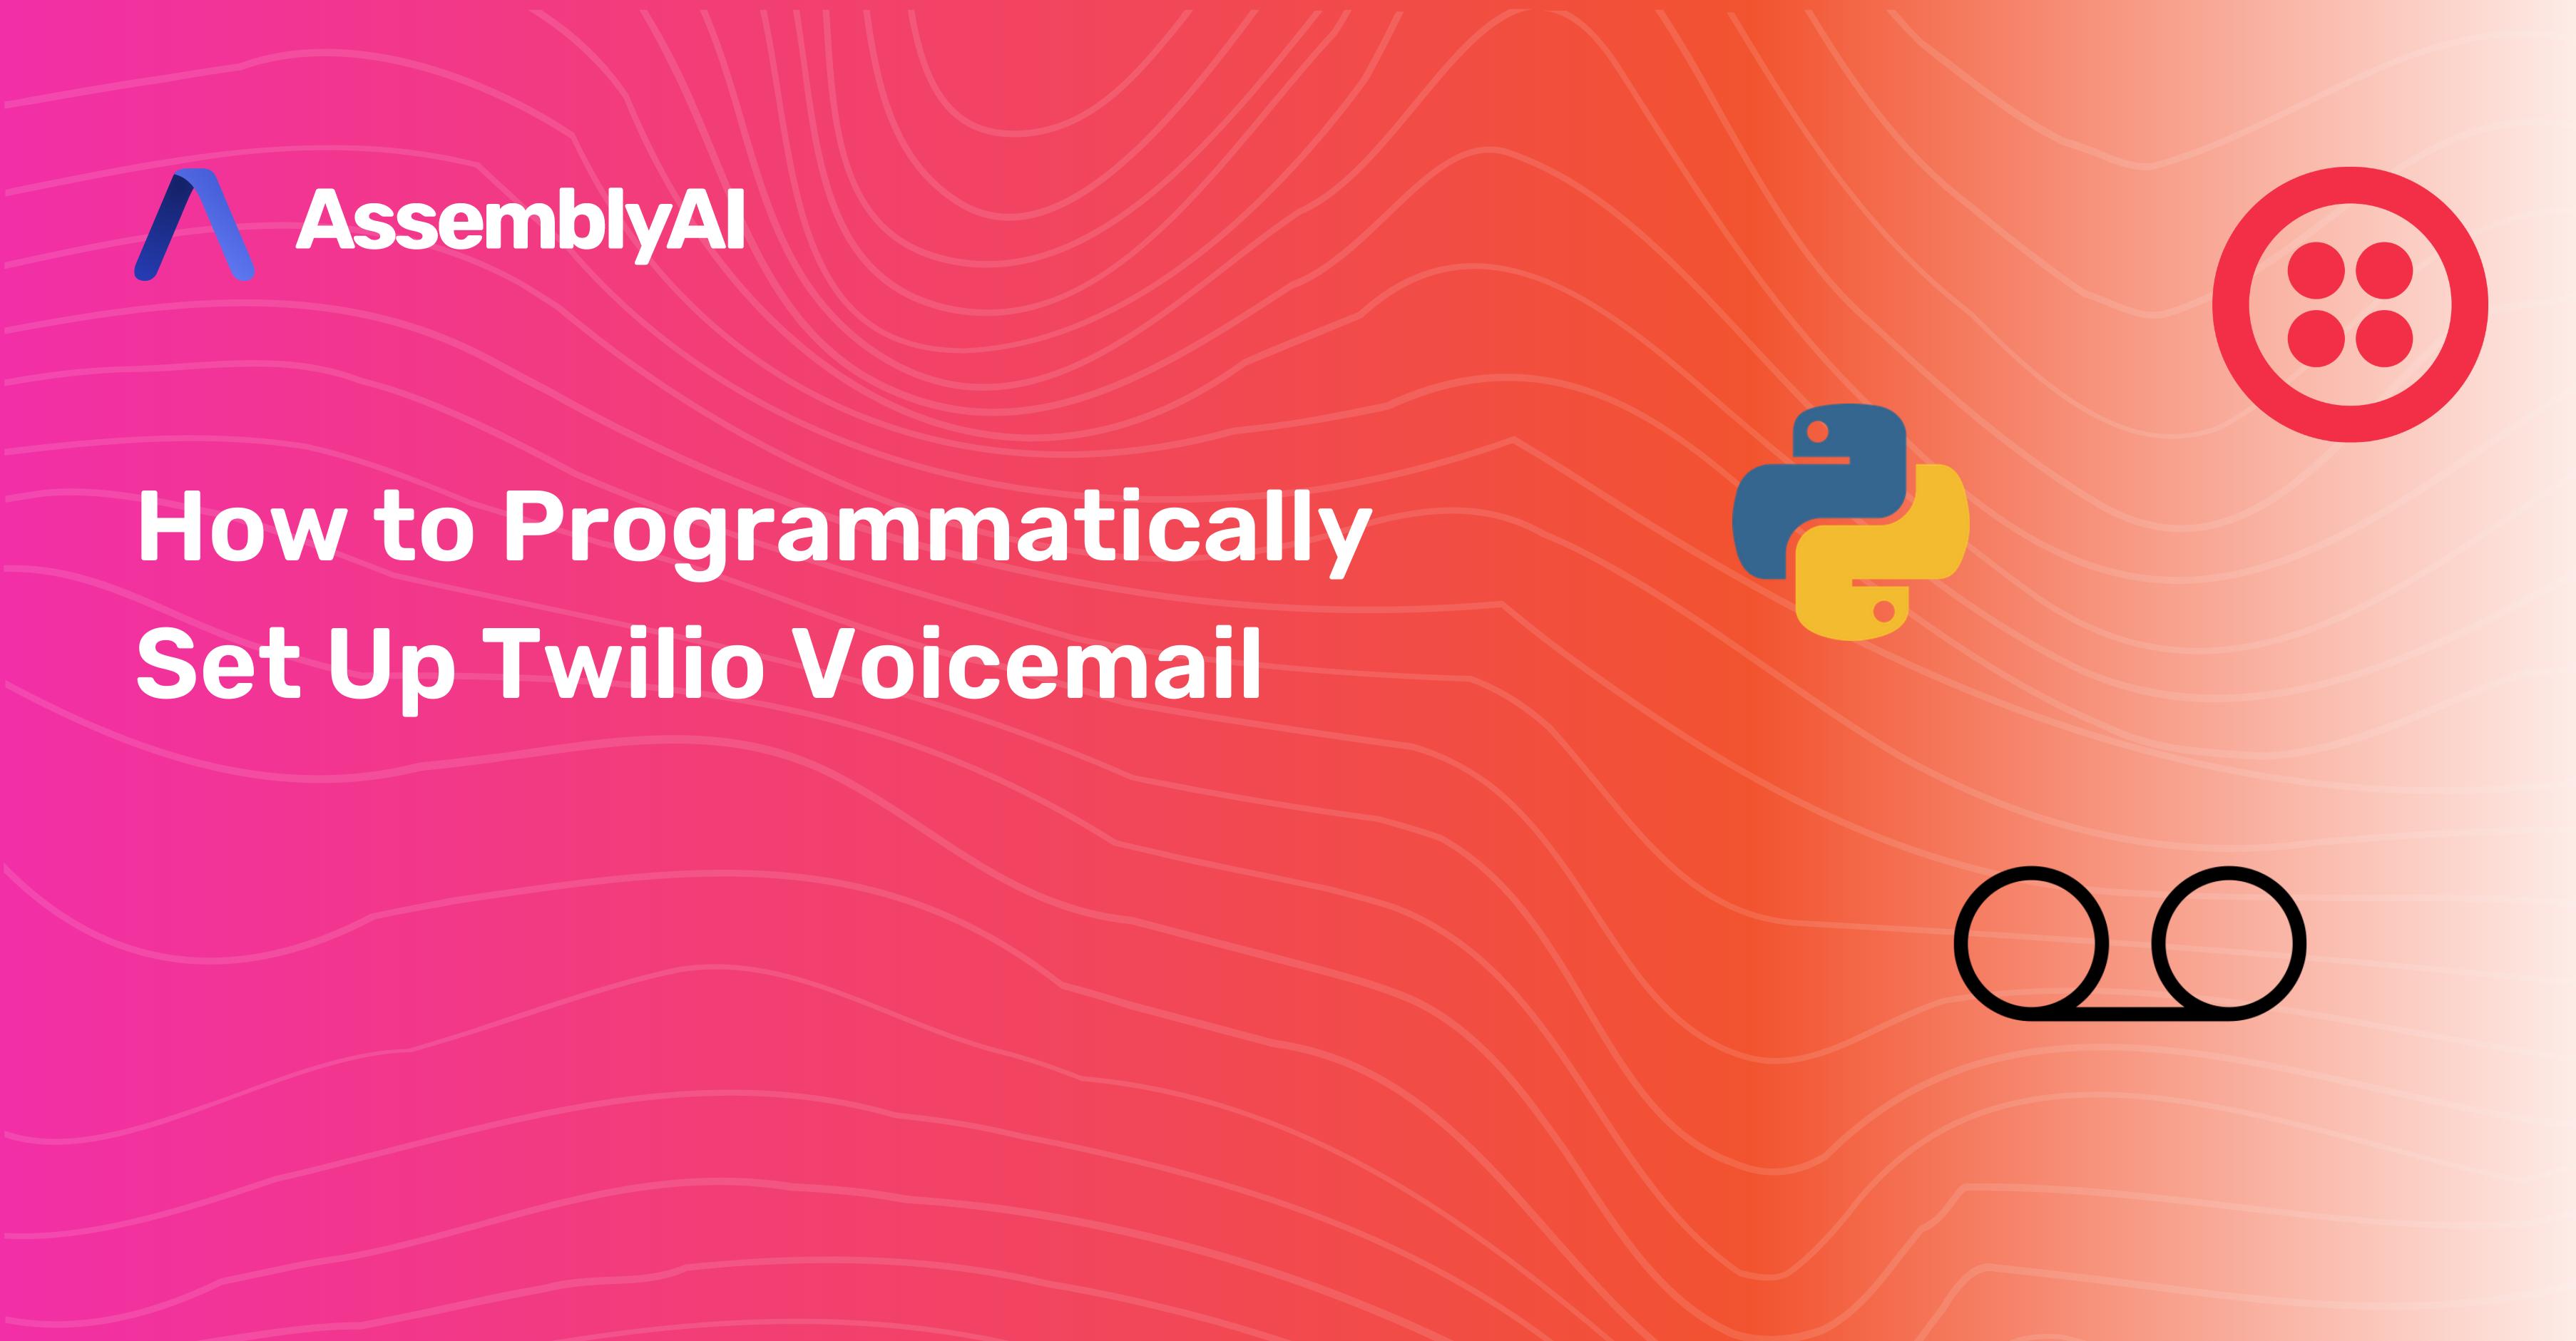 How to Programmatically Set Up Twilio Voicemail